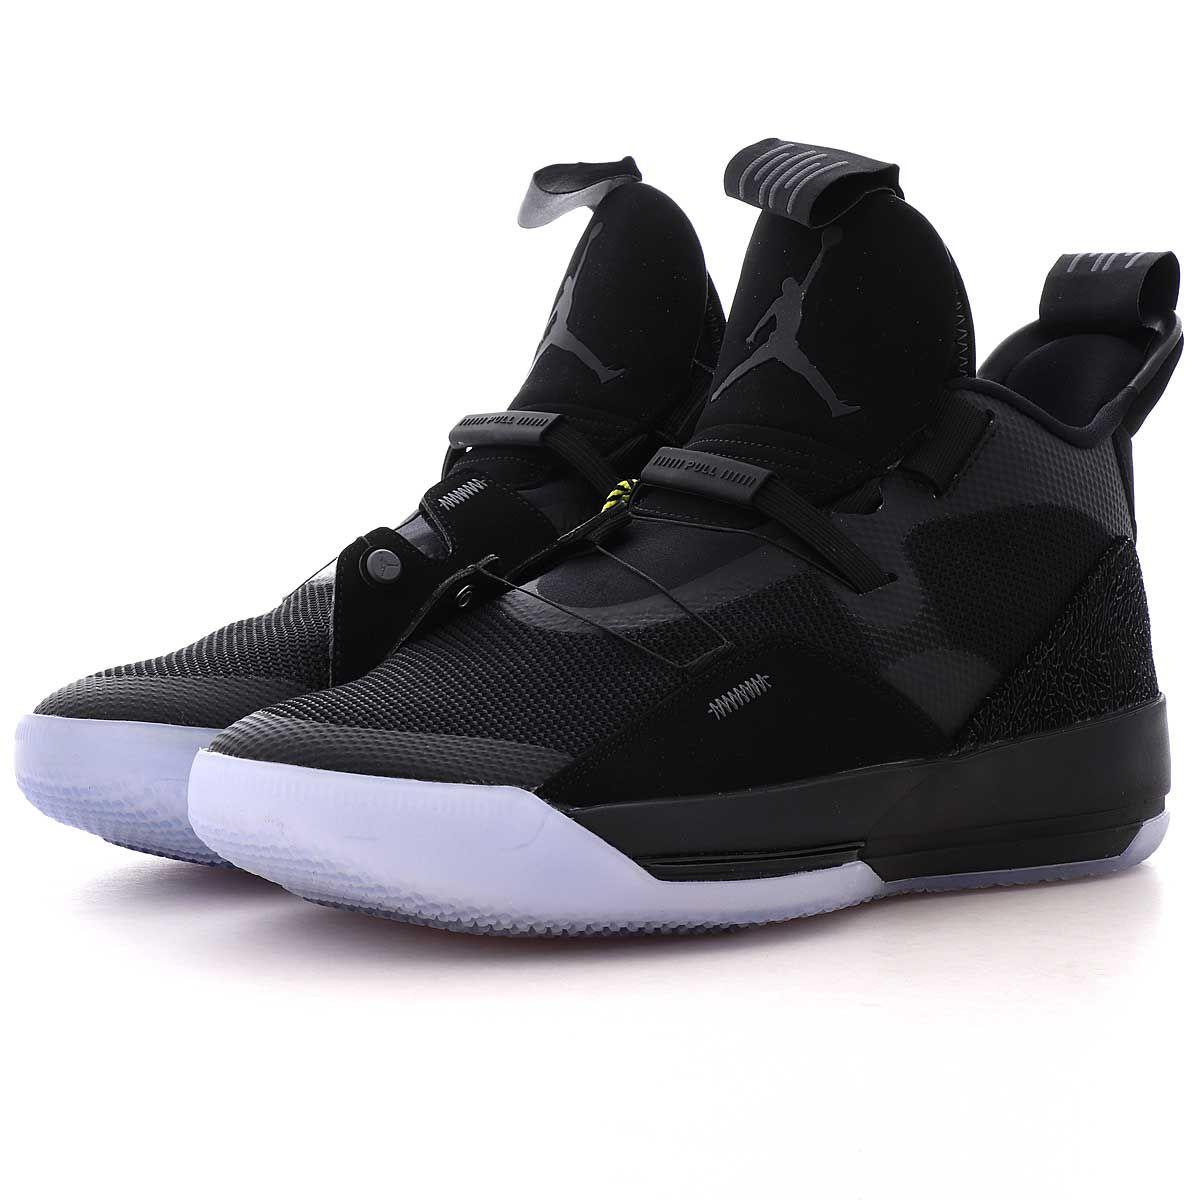 Air Jordan Nike Baskets Bleubleu marine Sporthabillé